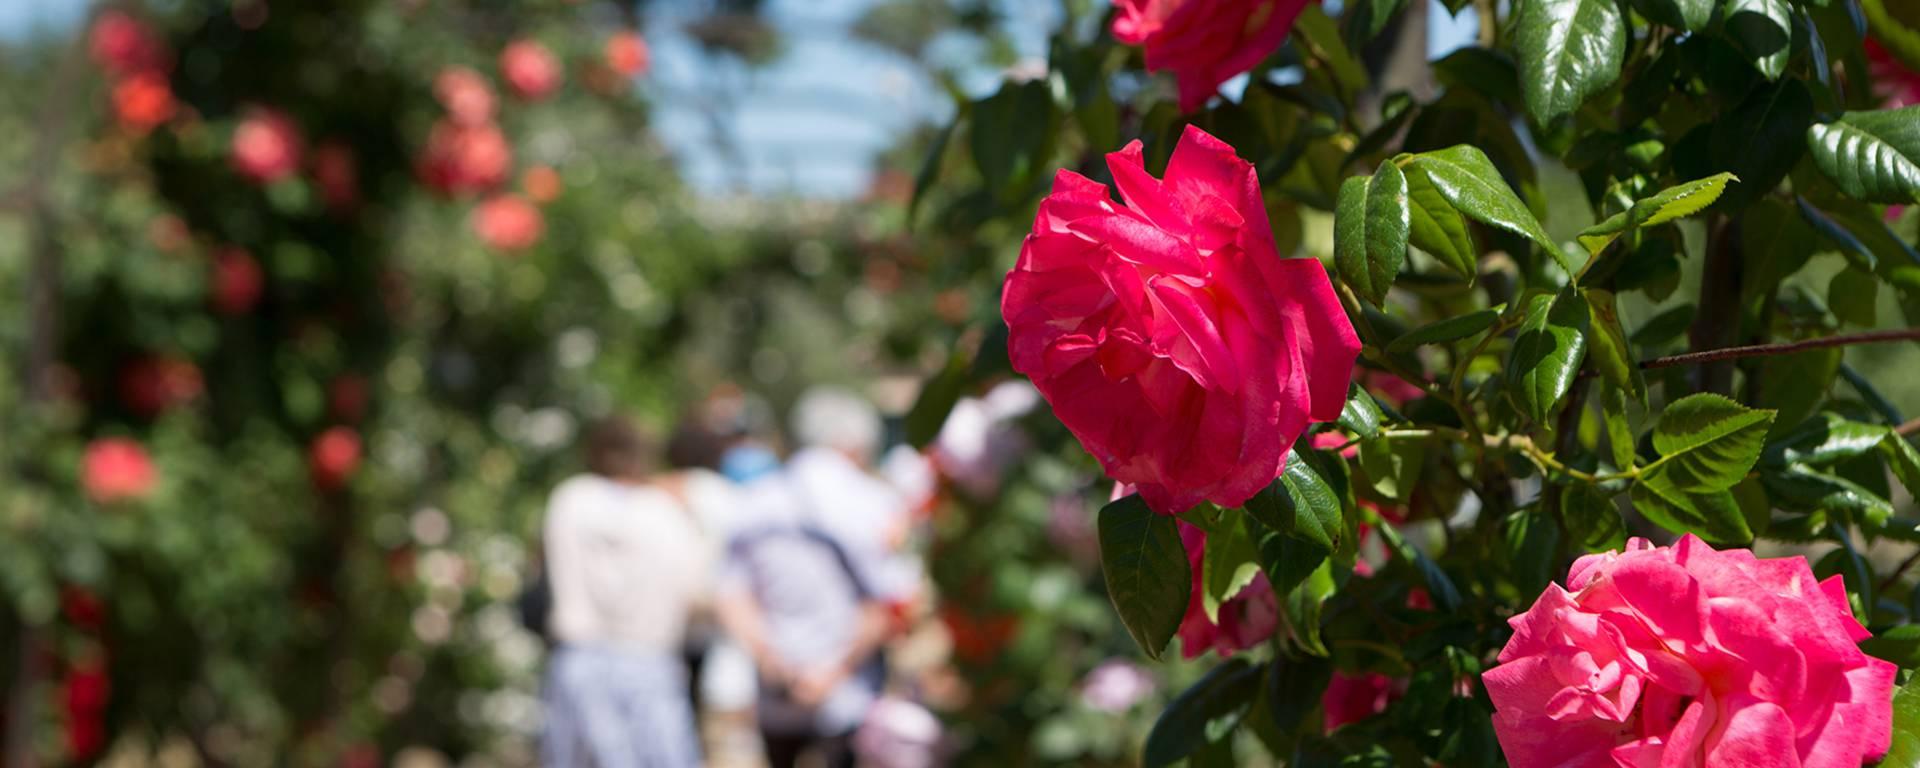 Rose garden ©Mairie d'Antibes - J. Bayle